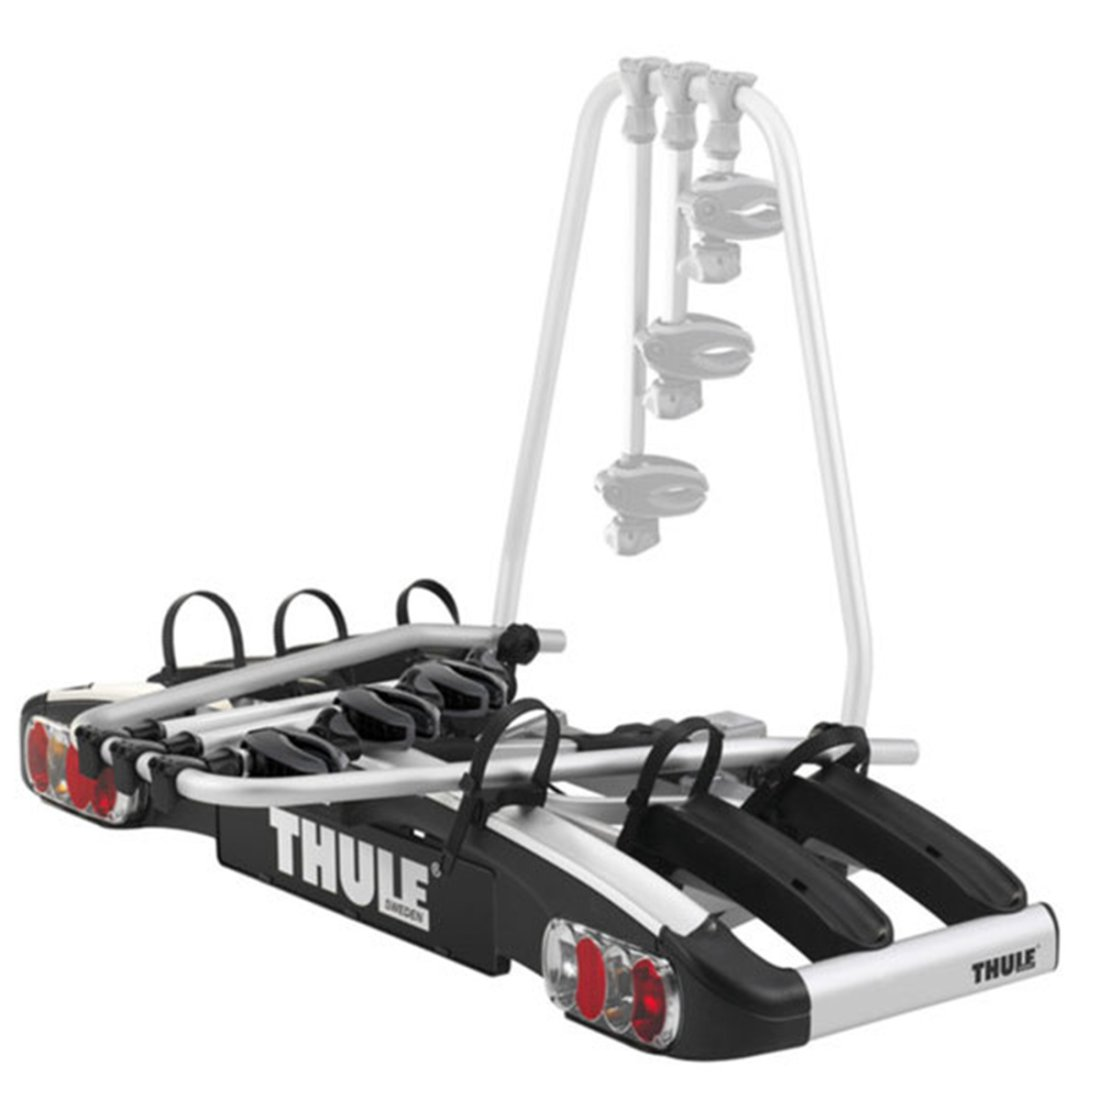 thule euroclassic g6 929 bike rack motocard. Black Bedroom Furniture Sets. Home Design Ideas